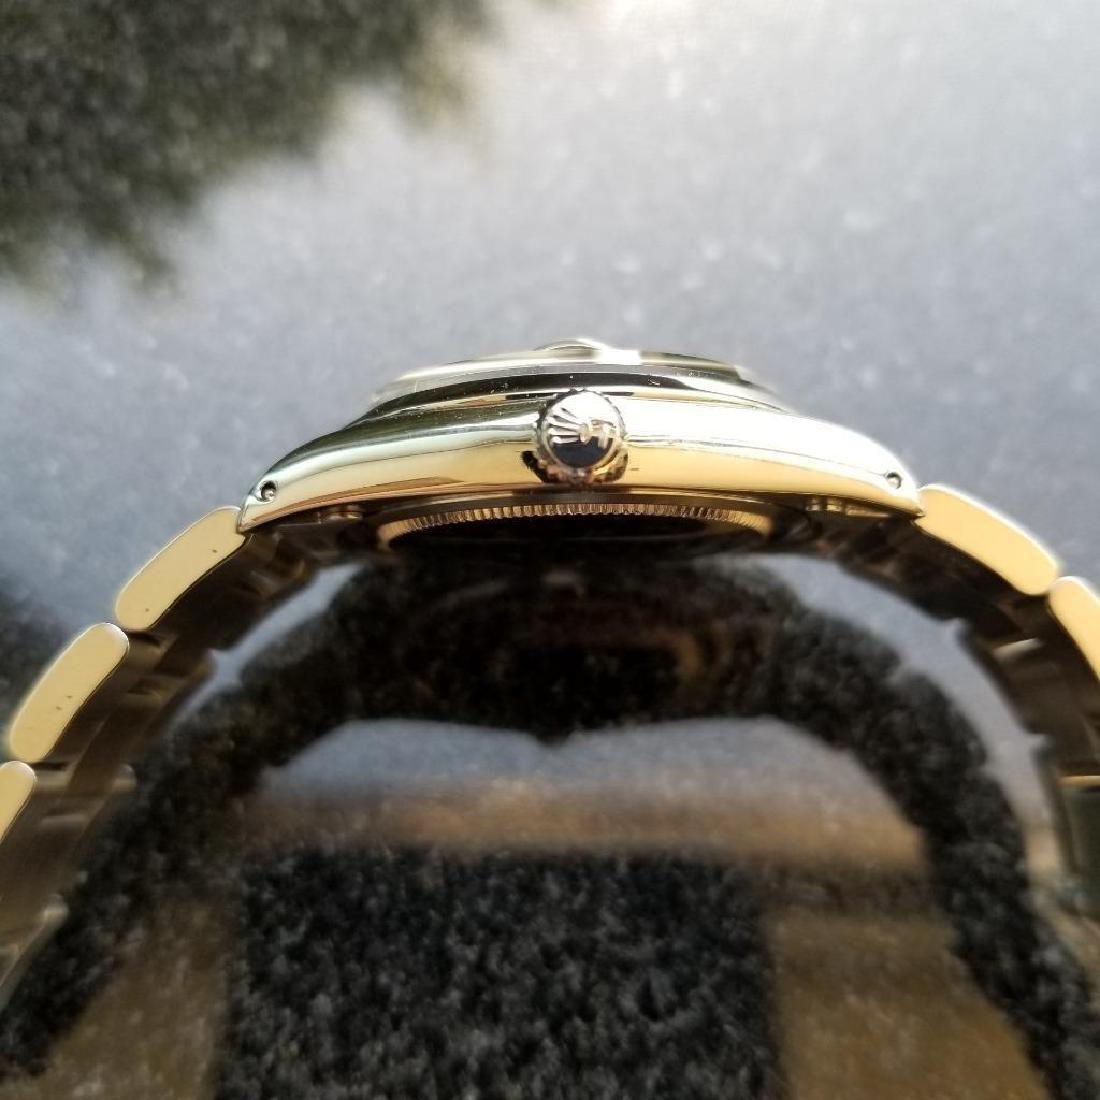 Rolex Vintage Precision Oysterdate 1954 6694 Manual - 5